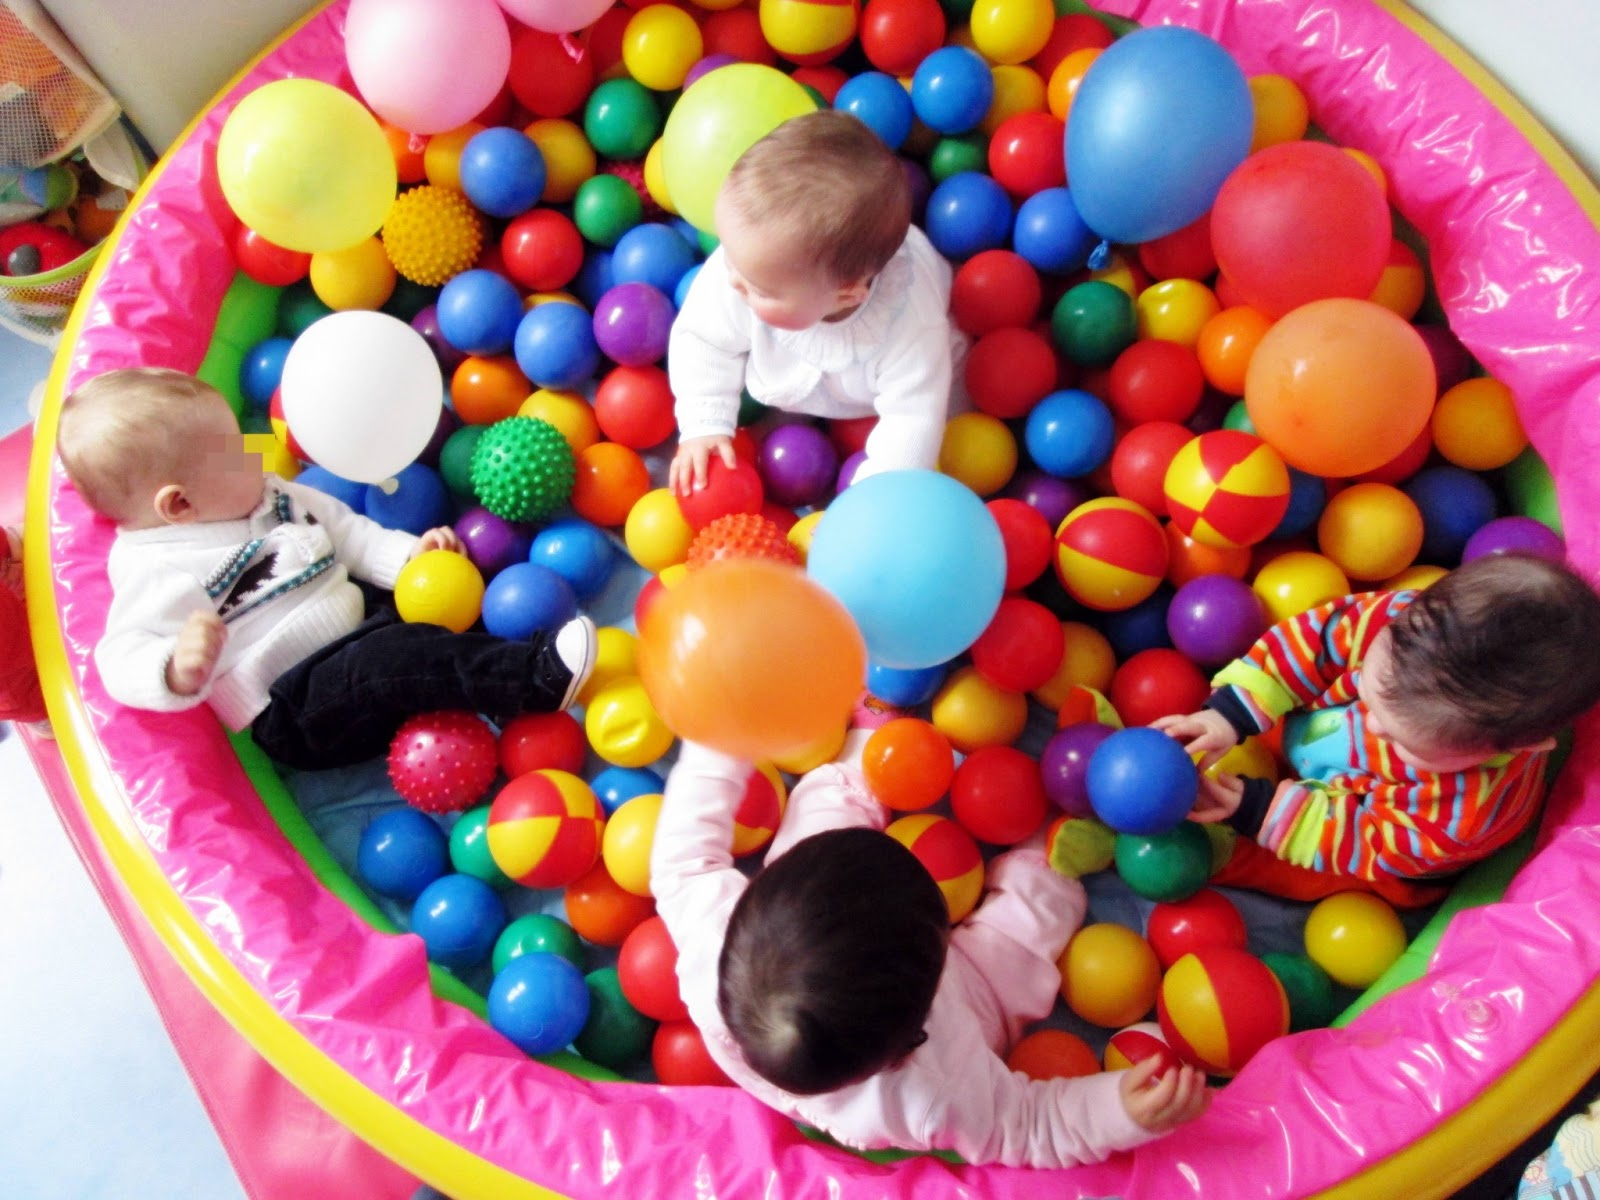 Sala dos beb s bolas e bal es for Piscina de bolas para bebes